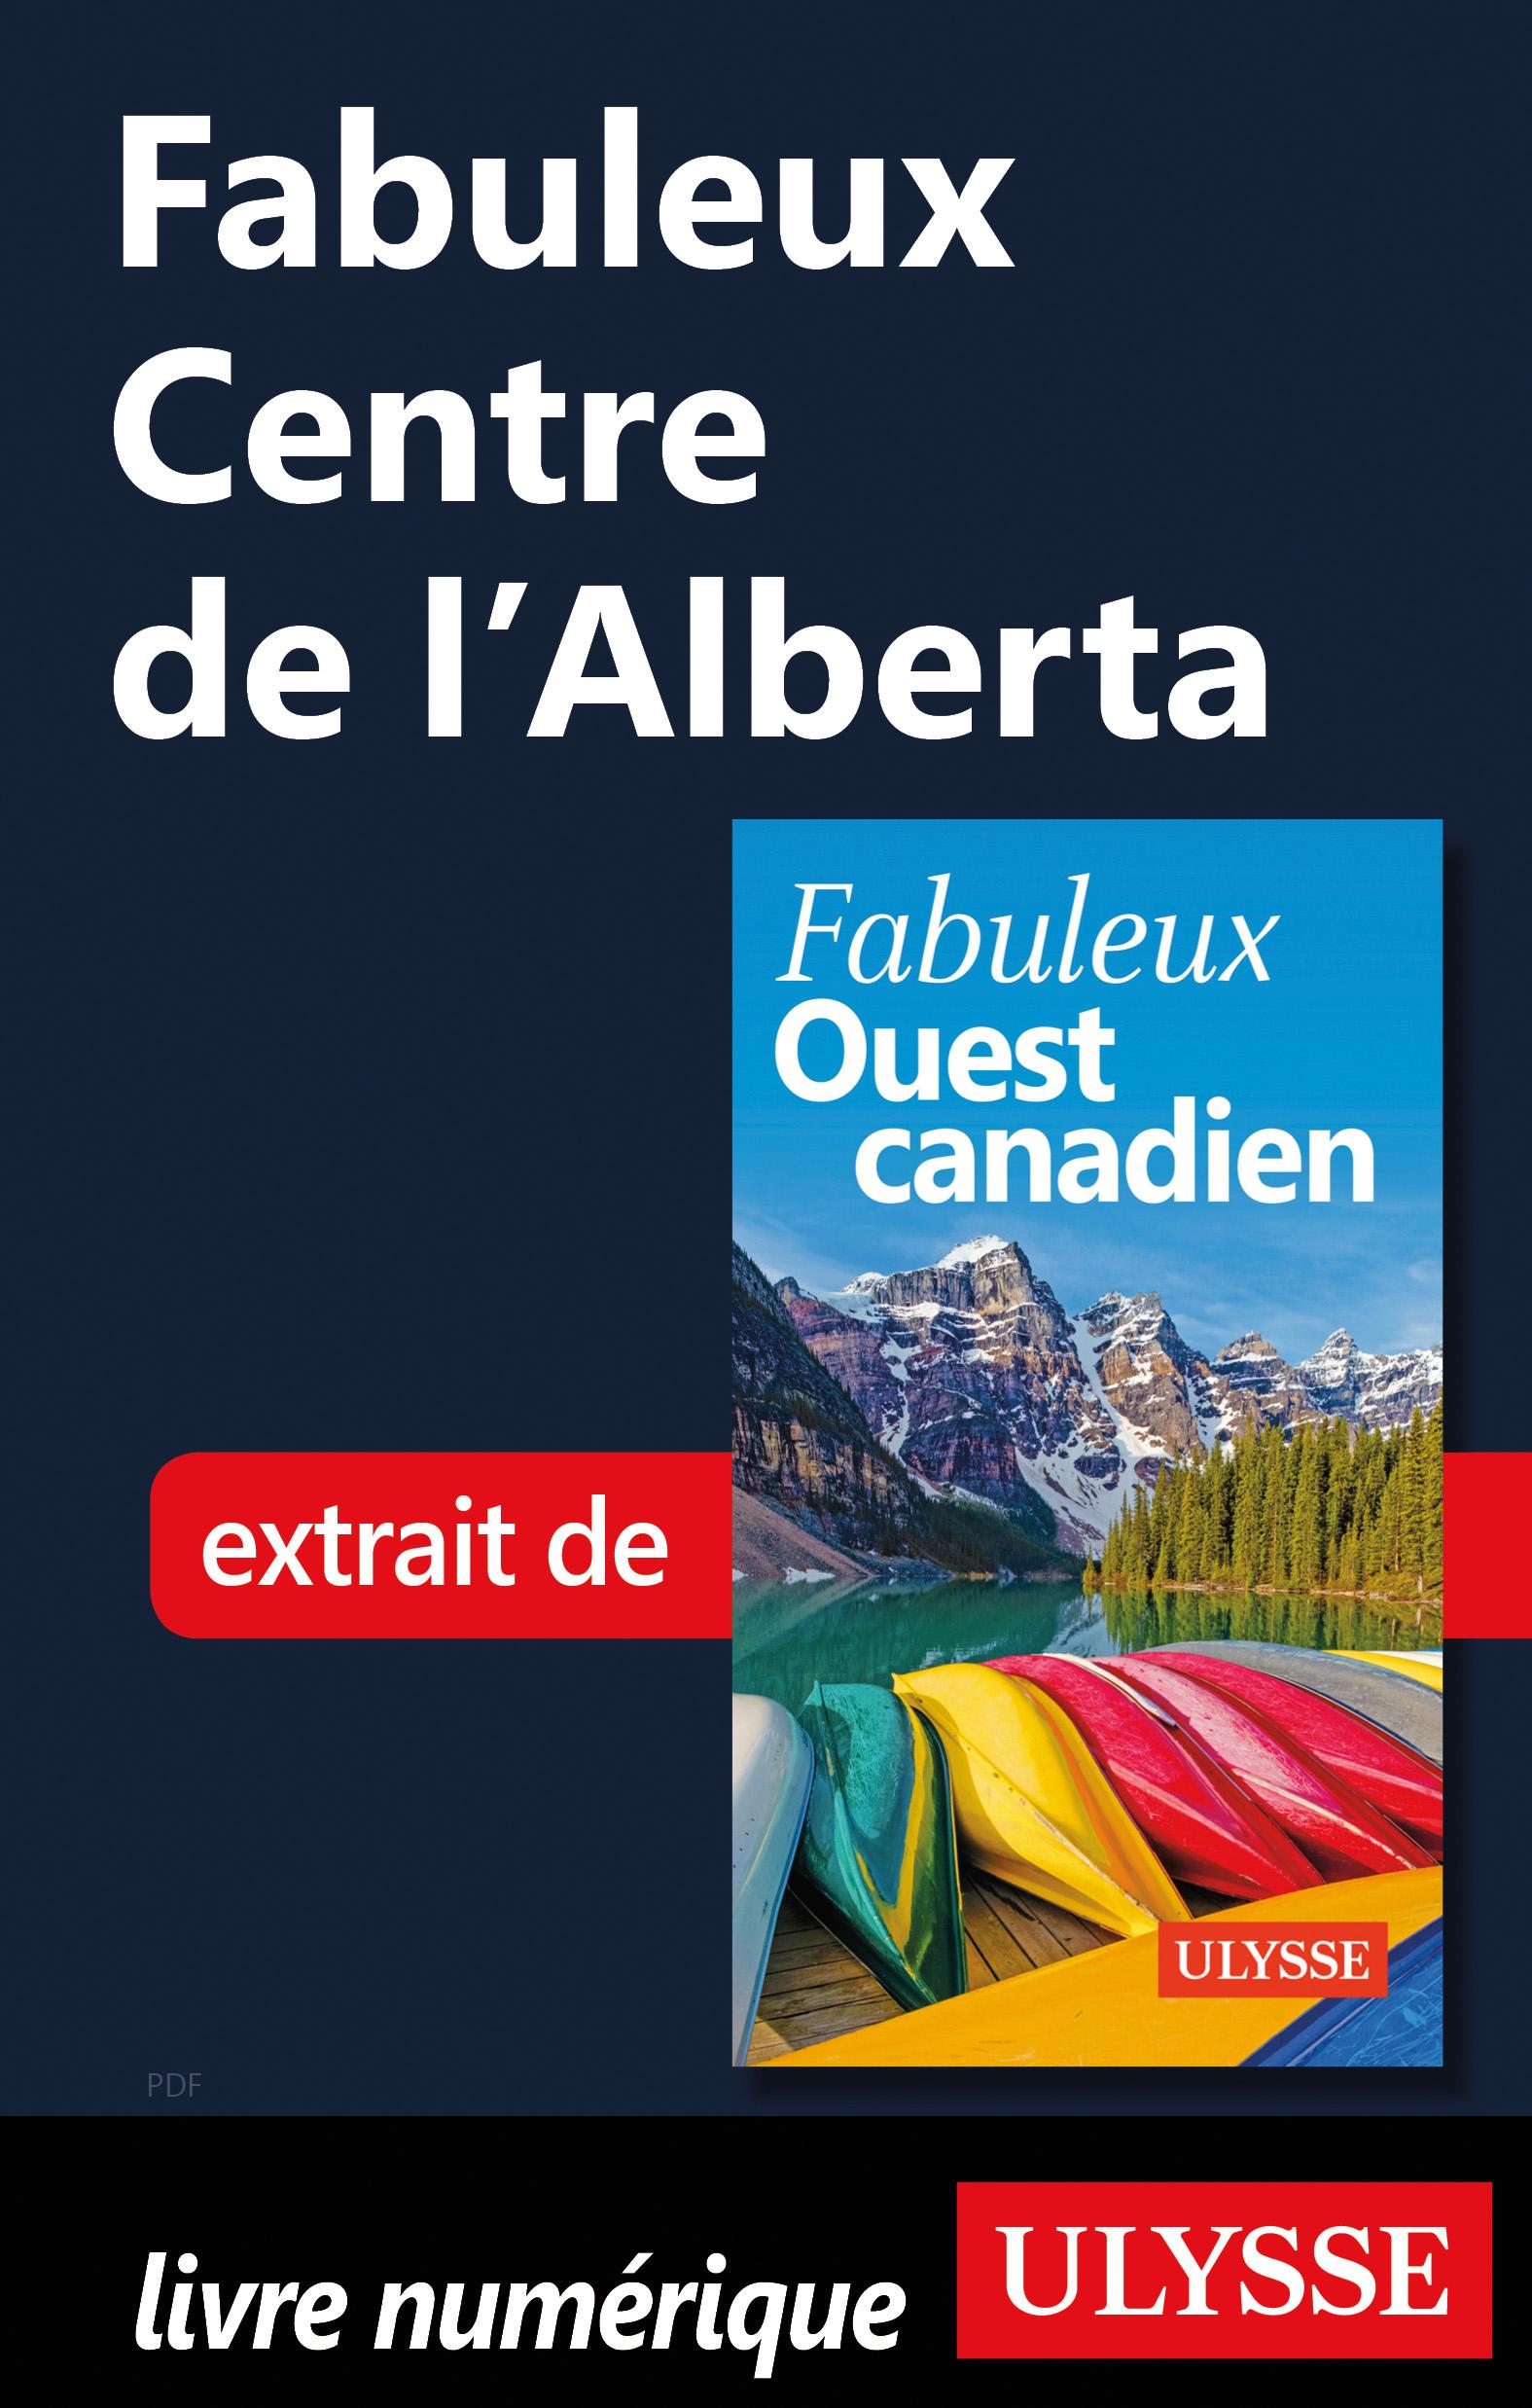 Fabuleux Centre de l'Alberta